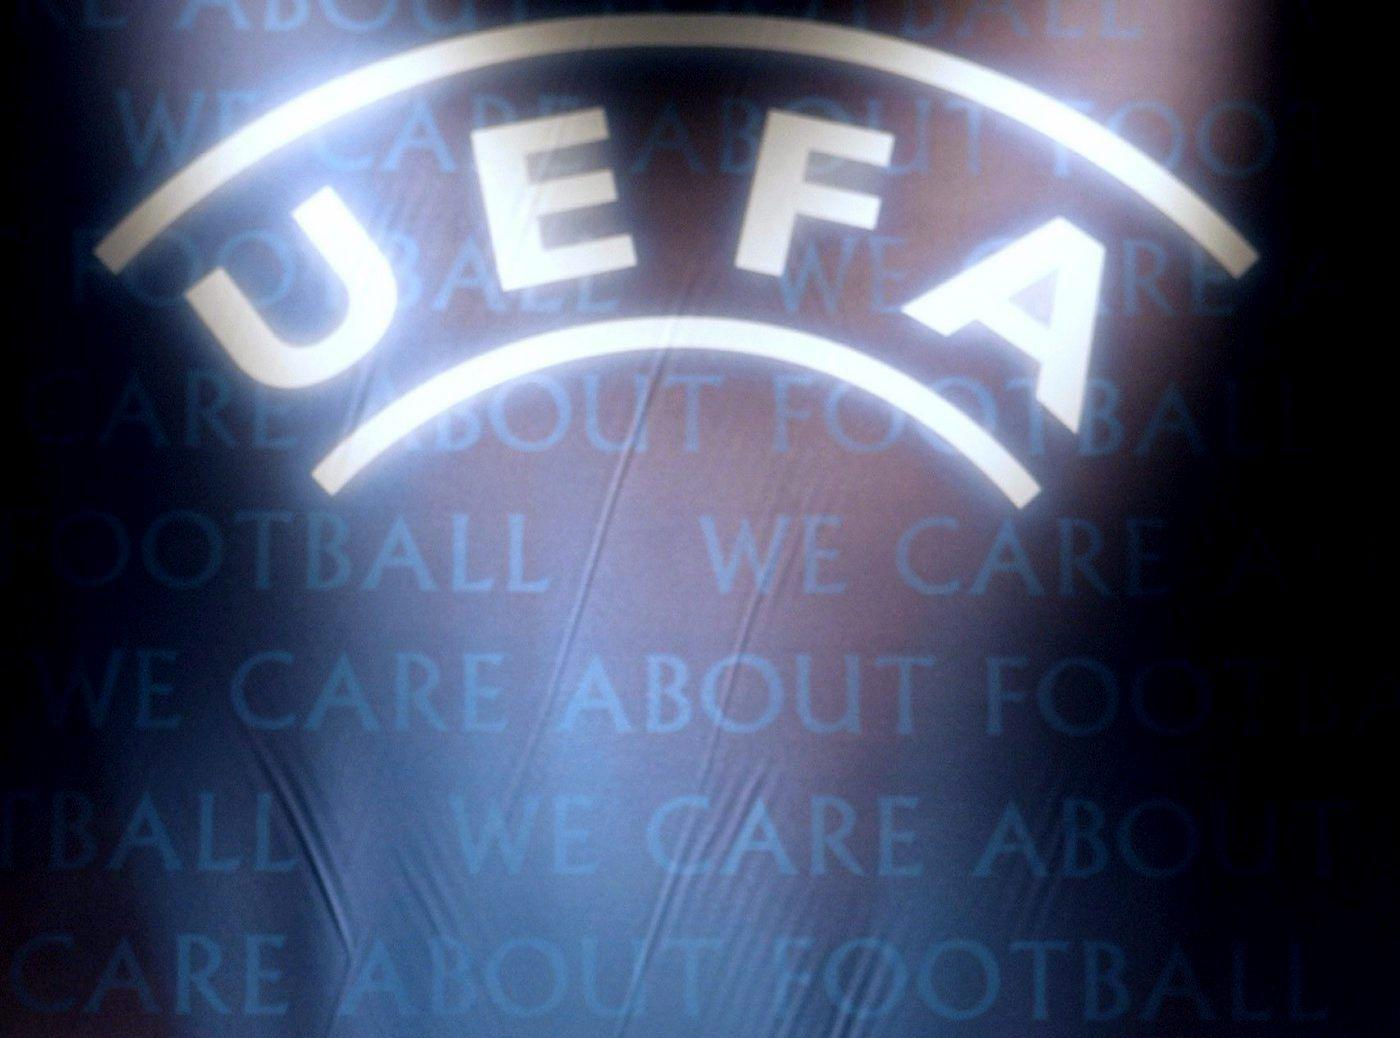 UEFA / Logo / Schriftzug